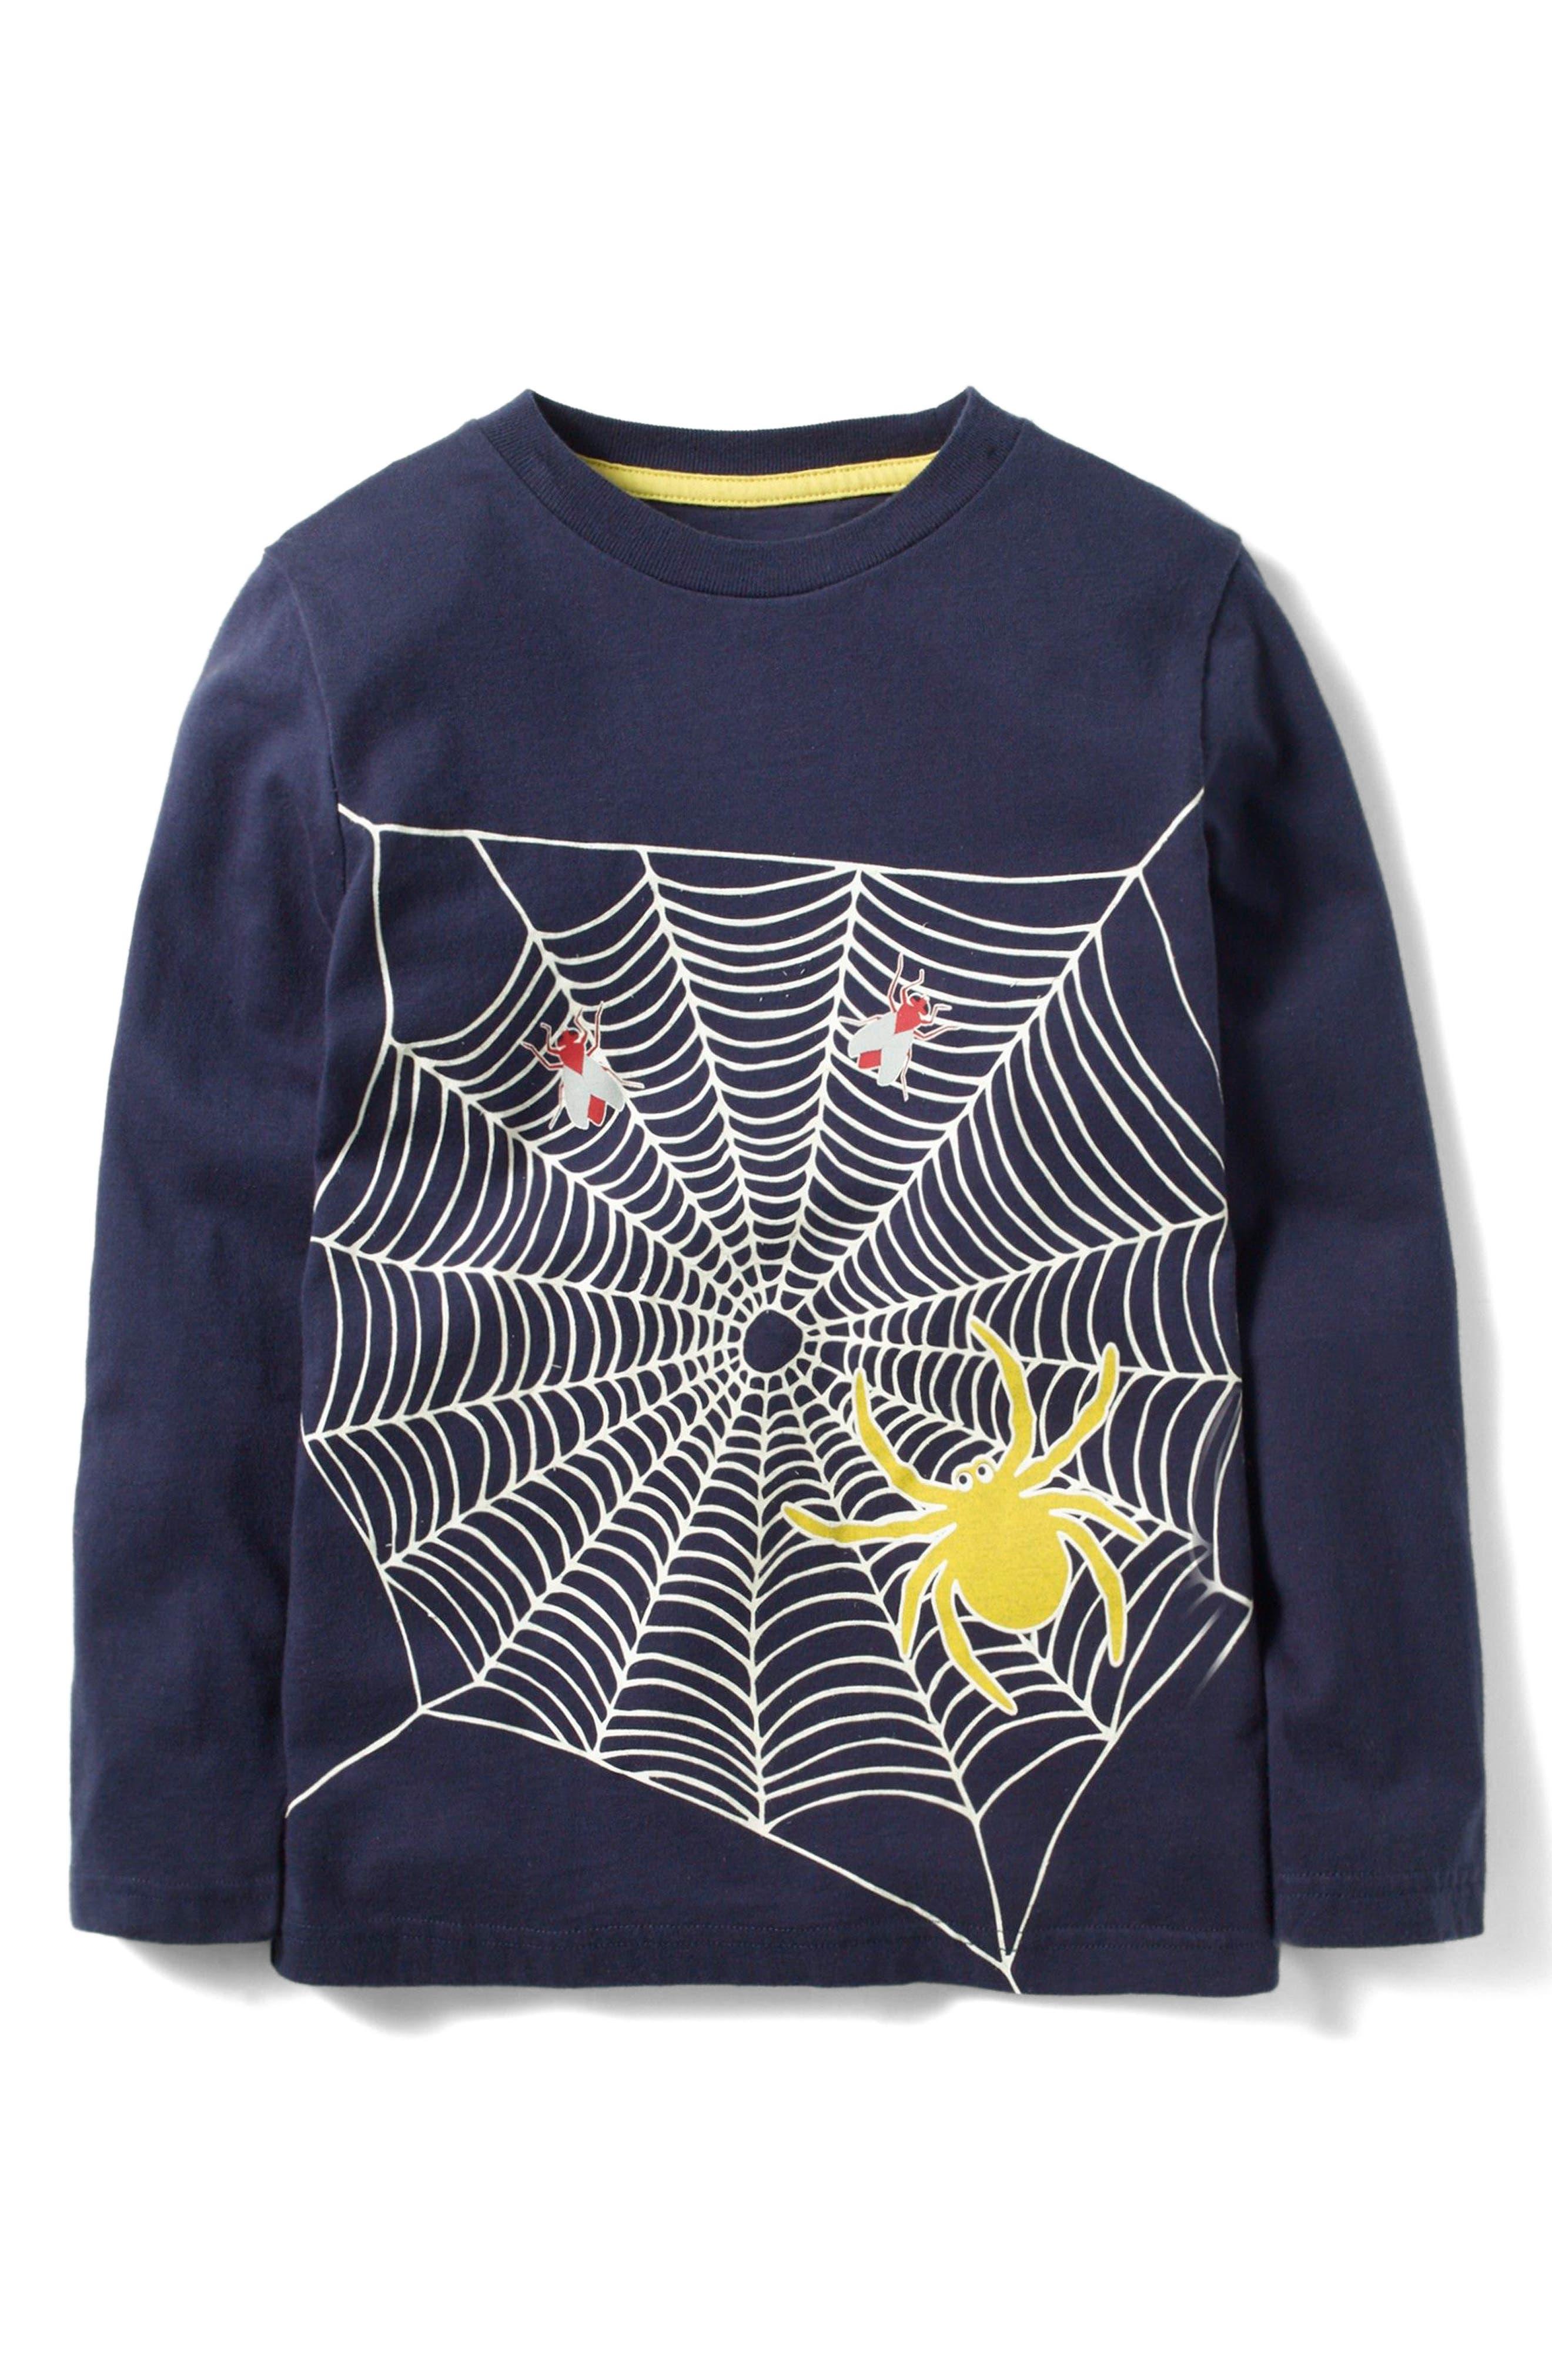 Main Image - Mini Boden Spooky Glow T-Shirt (Toddler Boys, Little Boys & Big Boys)